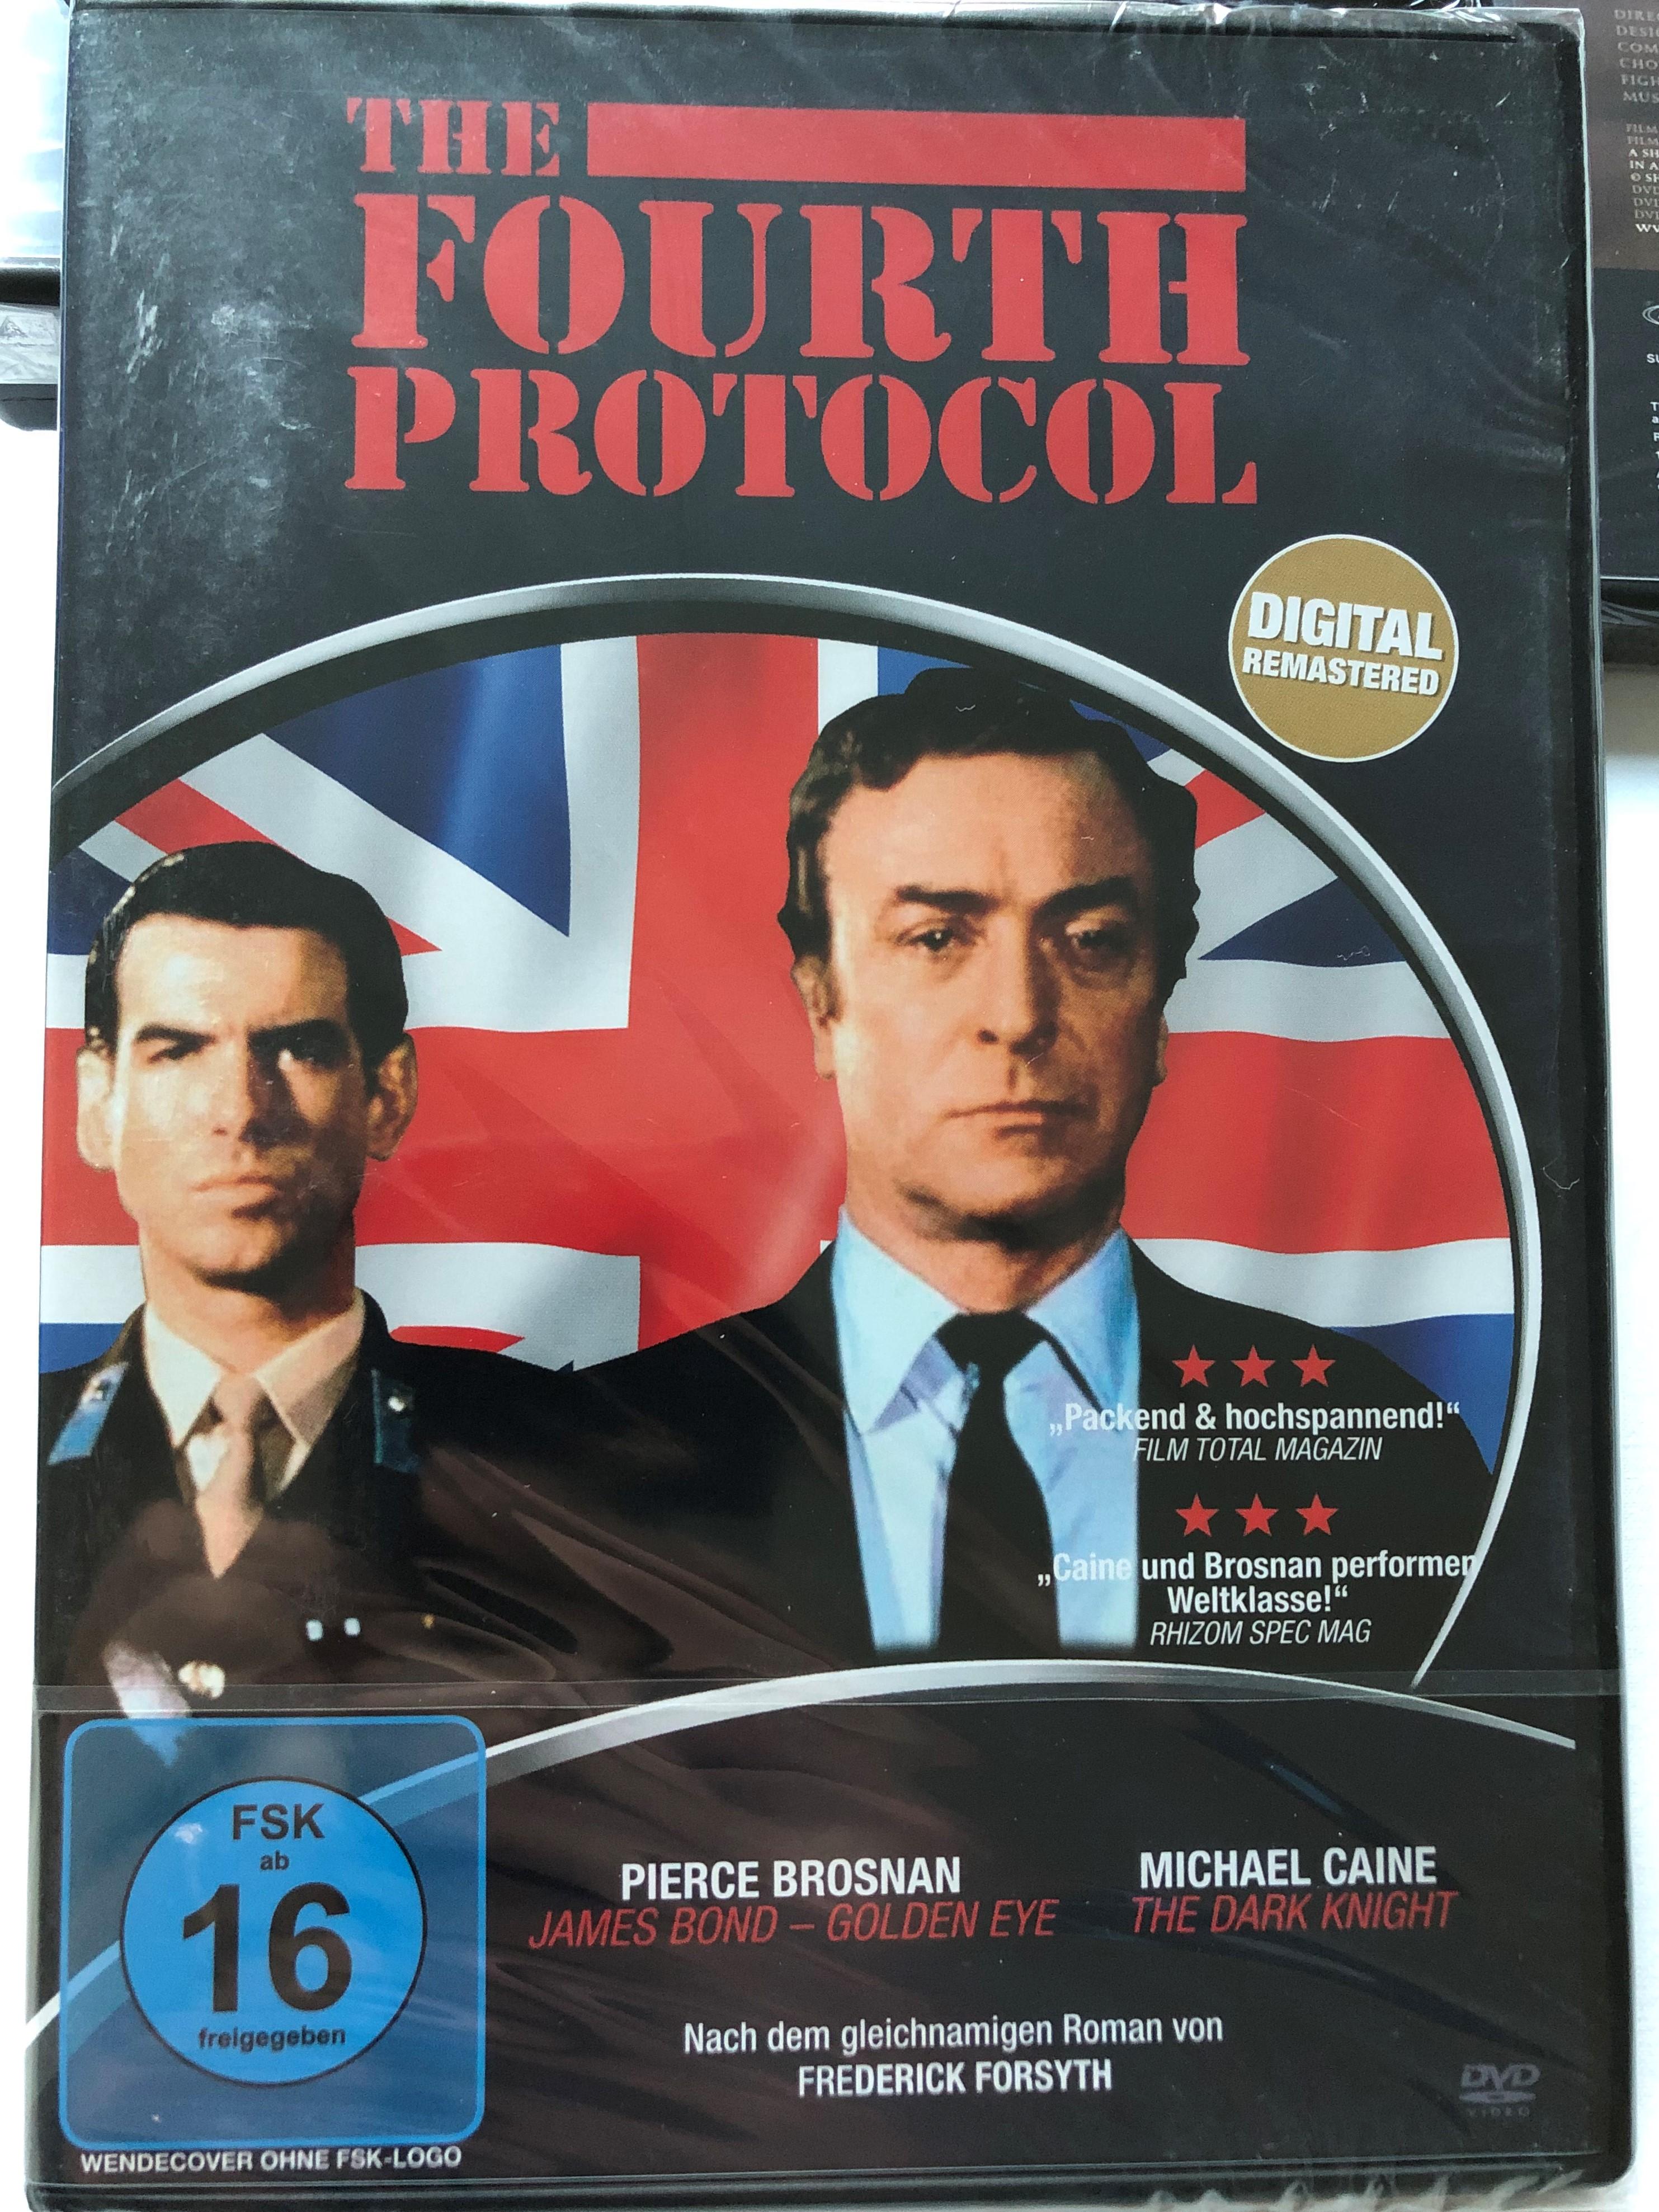 the-fourth-protocol-dvd-1987-das-vierte-protokoll-digital-remastered-directed-by-john-mackenzie-starring-pierce-brosnan-michael-caine-based-on-frederick-forsyth-s-bestseller-1-.jpg